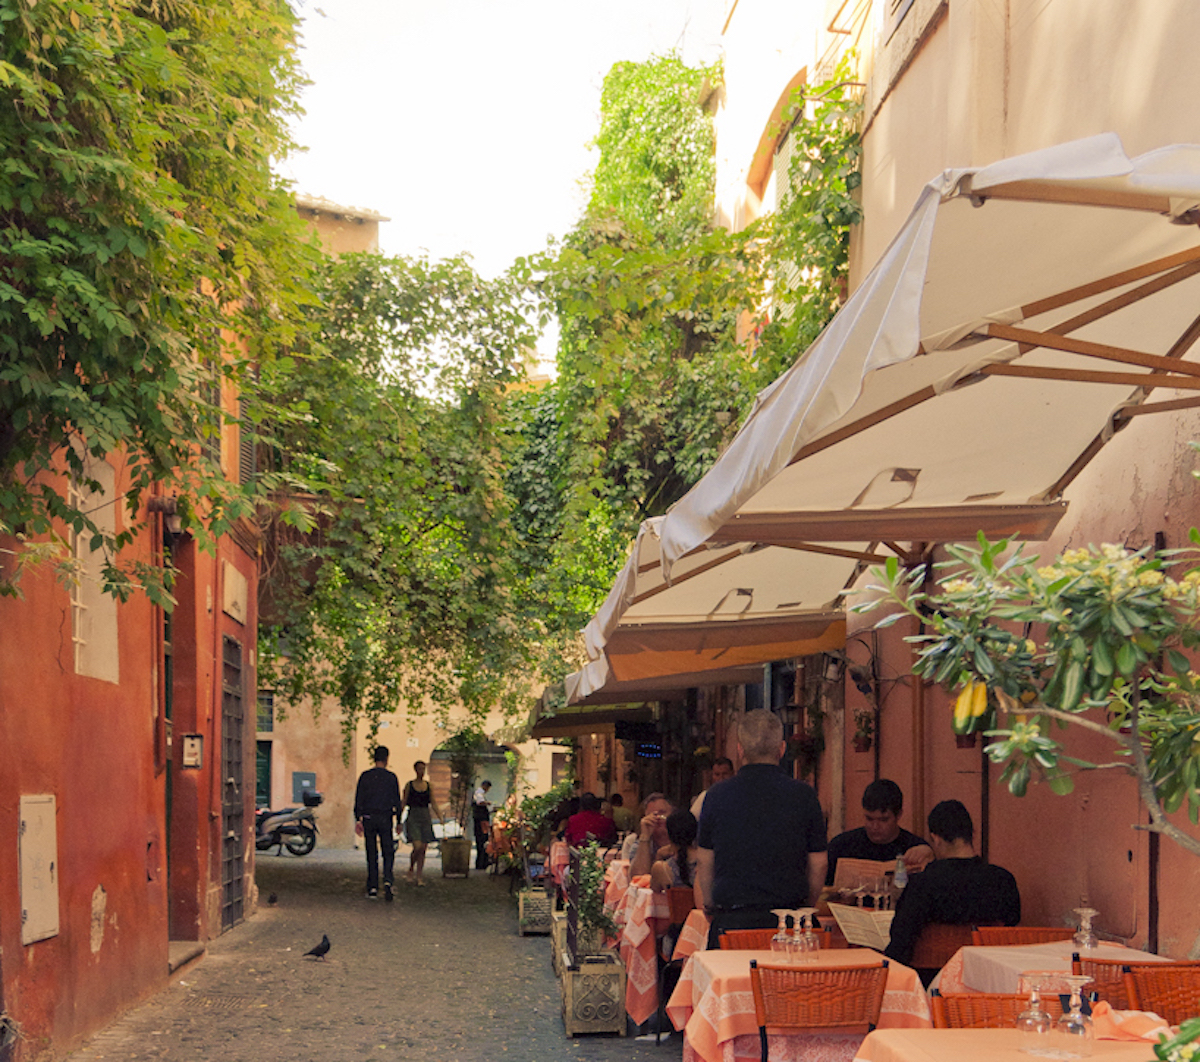 Penny Sadler of Dallas visits Trastevere, Rome